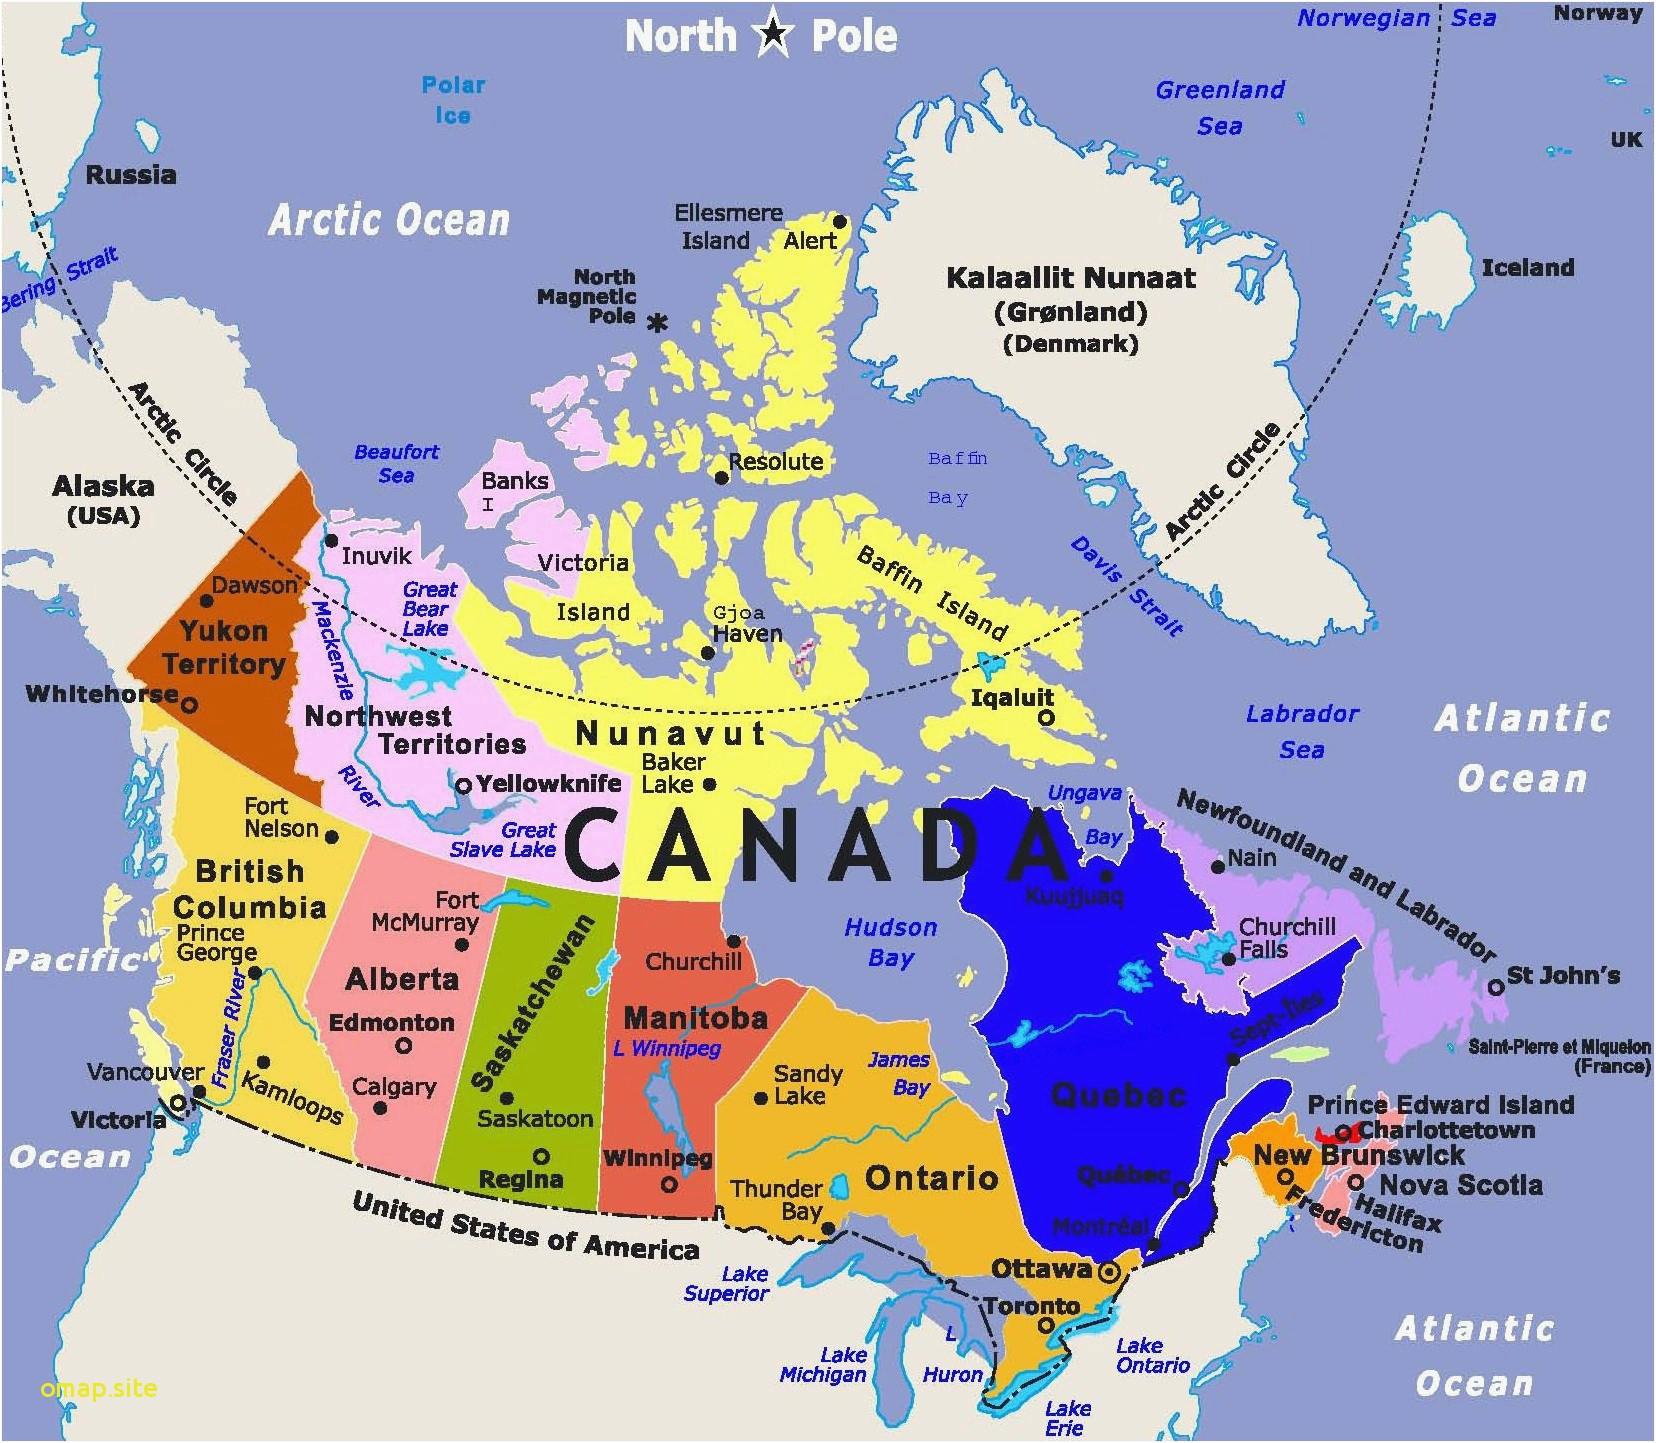 Calgary On Canada Map Hudson Ohio Map Hudson Bay On A Map Ungava Bay Canada Map Stock Map